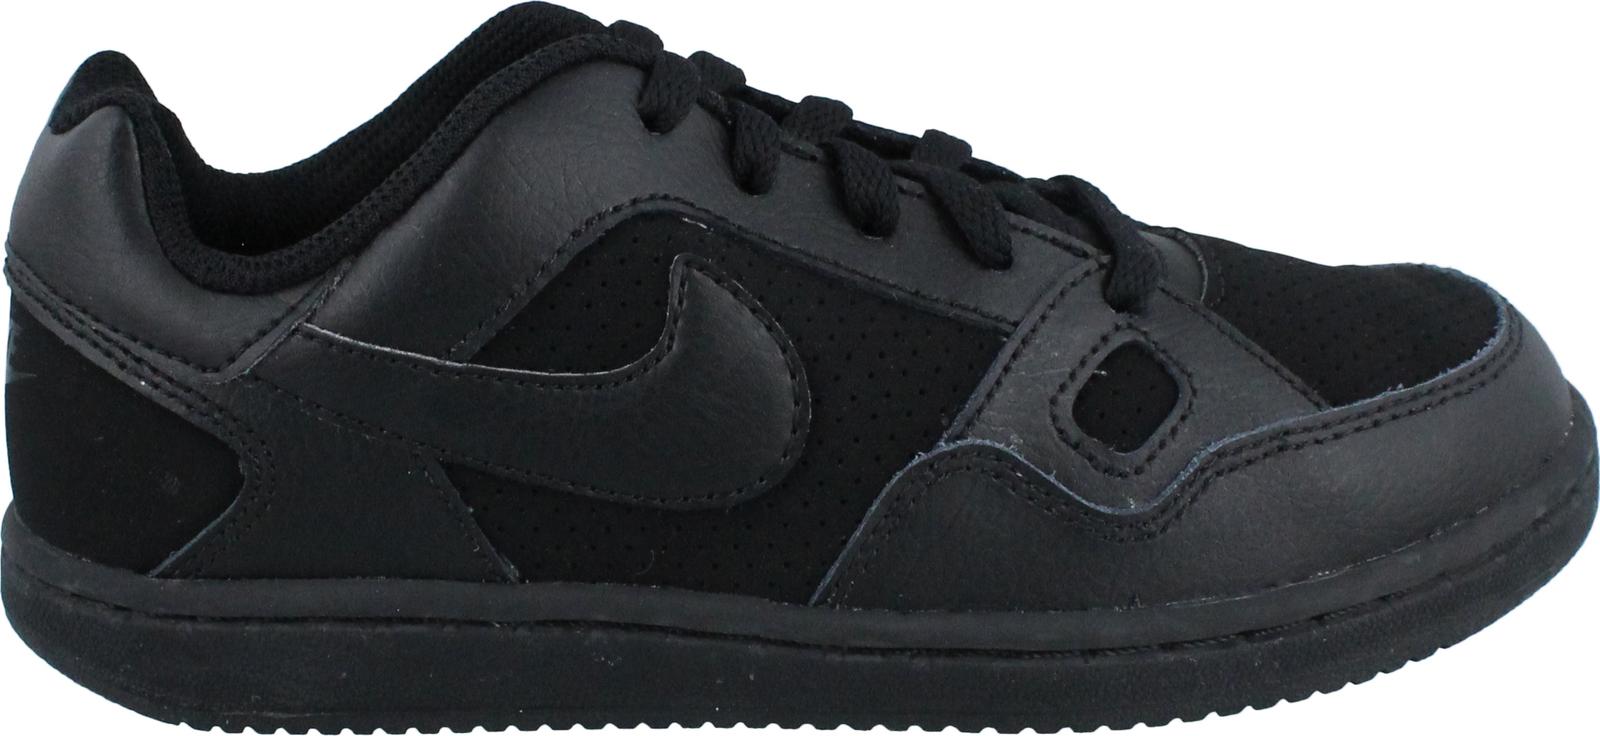 2c1c1d08b4cb Προσθήκη στα αγαπημένα menu Nike Son Force Ps